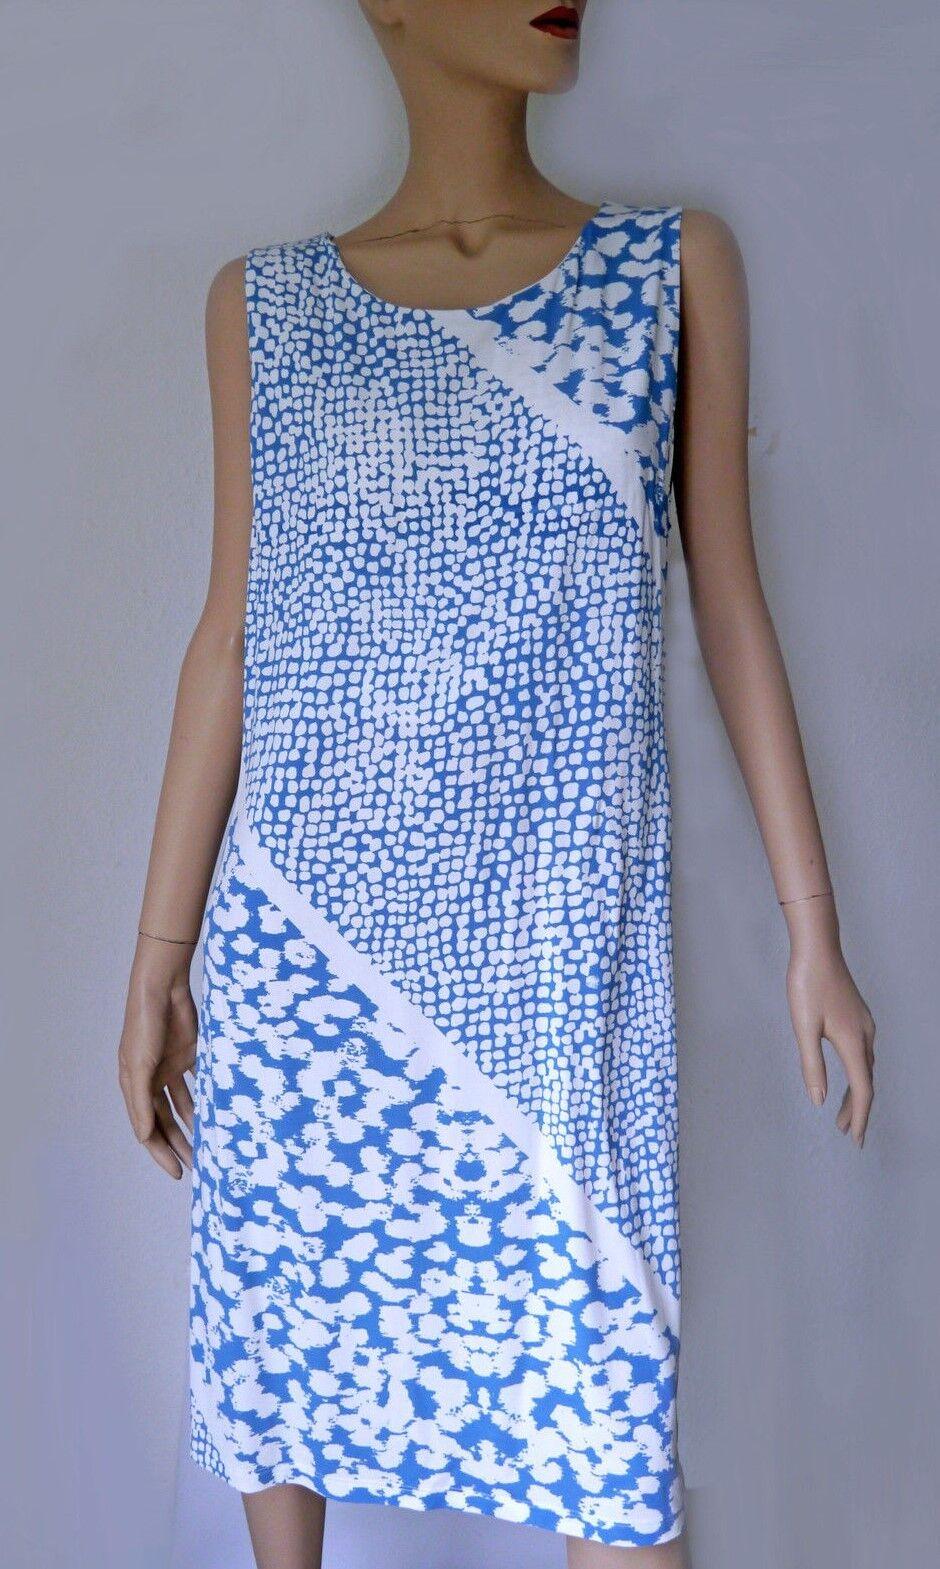 NICE CONNECTION Kleid 42 NEU Blau Weiss Viskose PE Elasthan